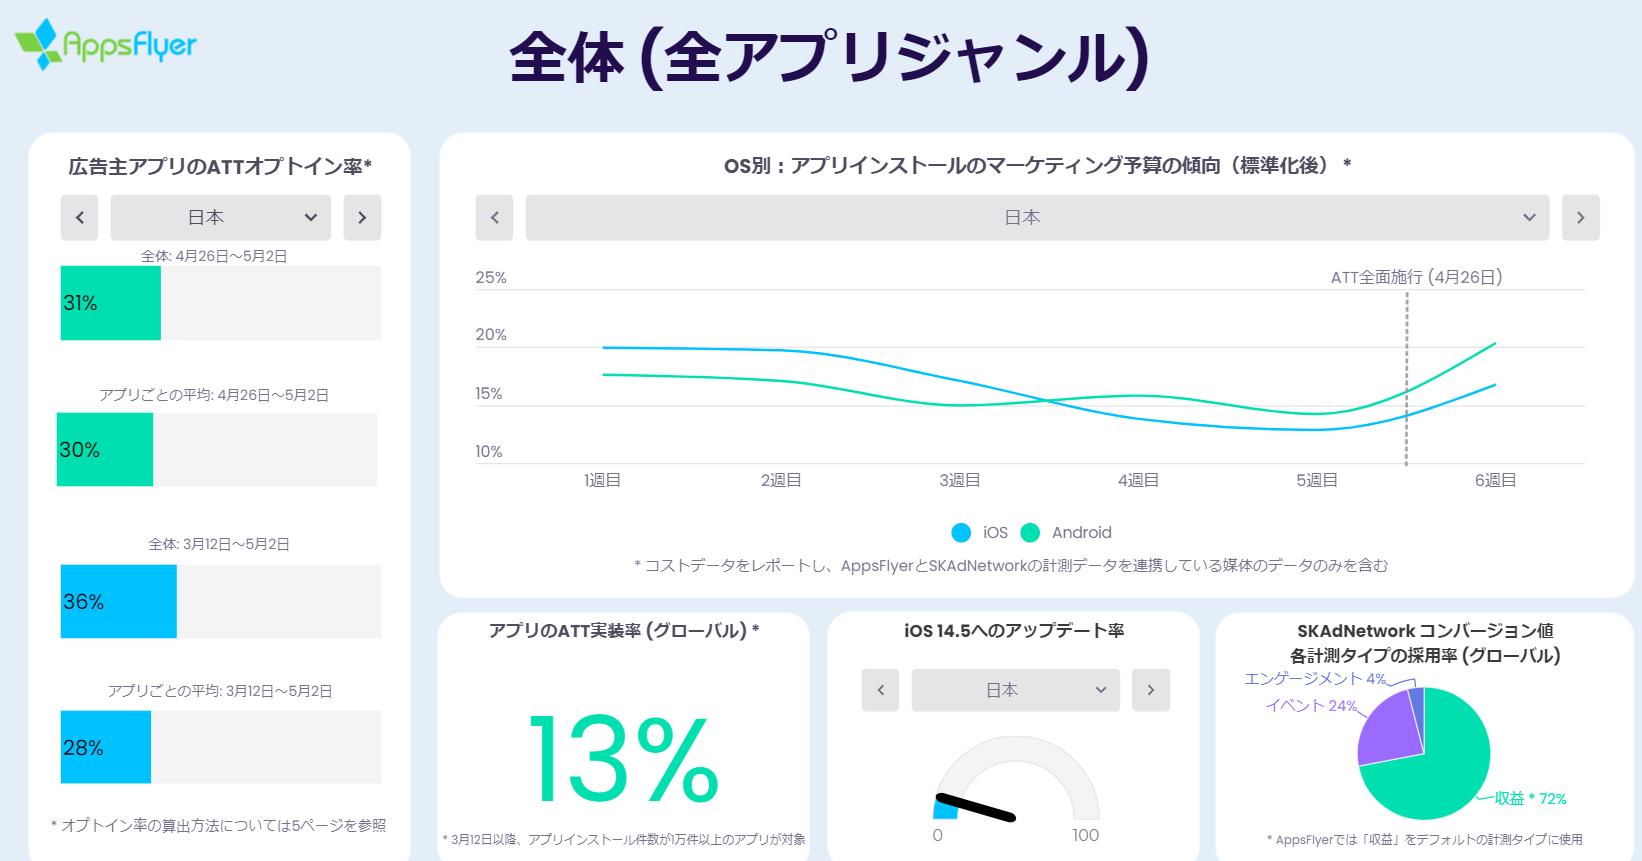 AppsFlyerATTreport202105_Japan